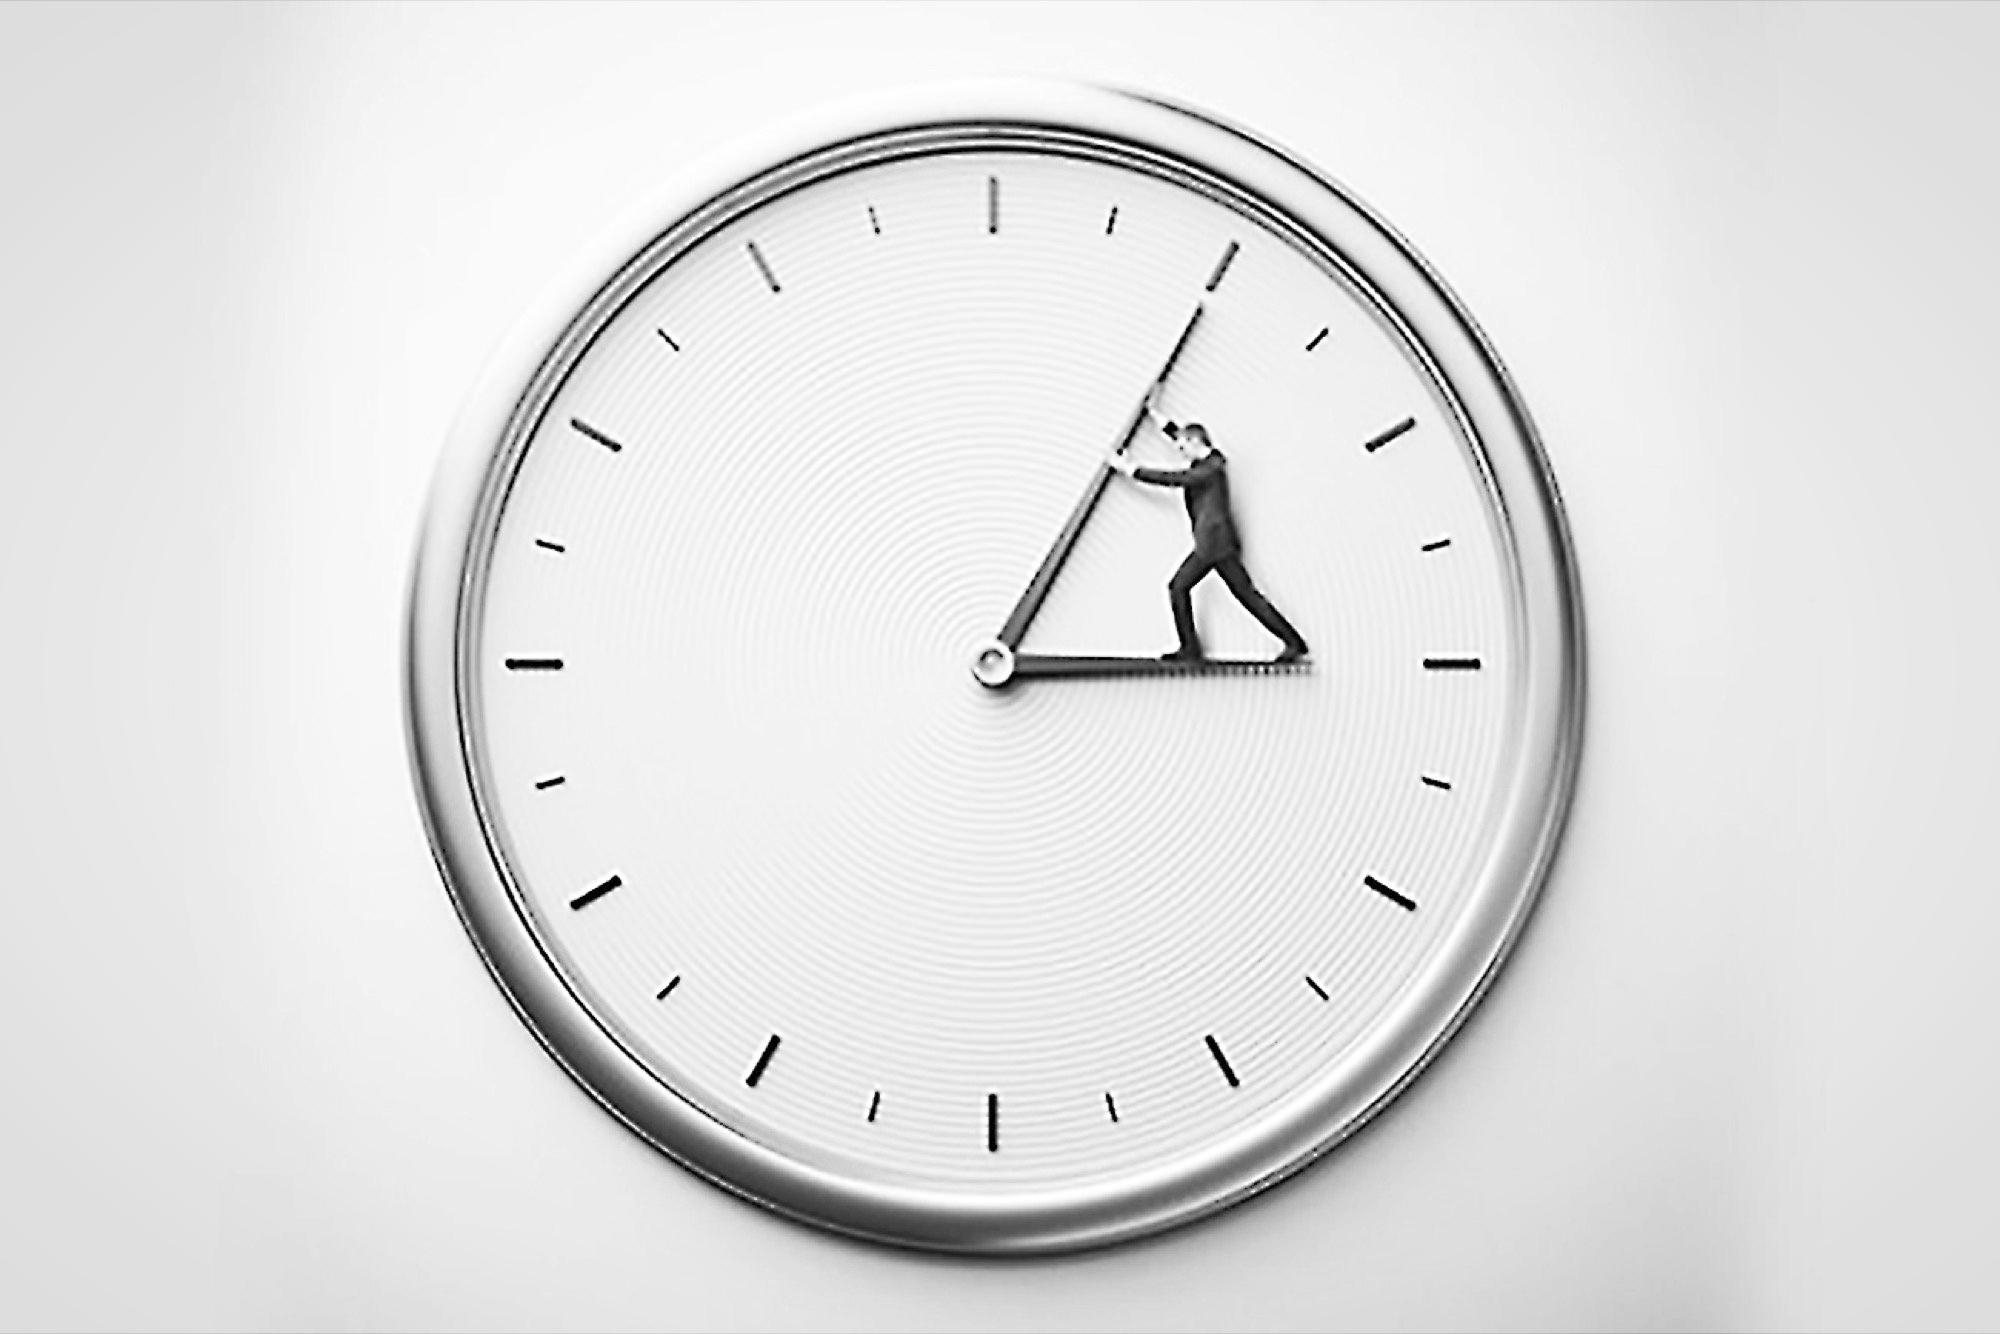 1413230823-5-tricks-maximize-time-office[2].jpg